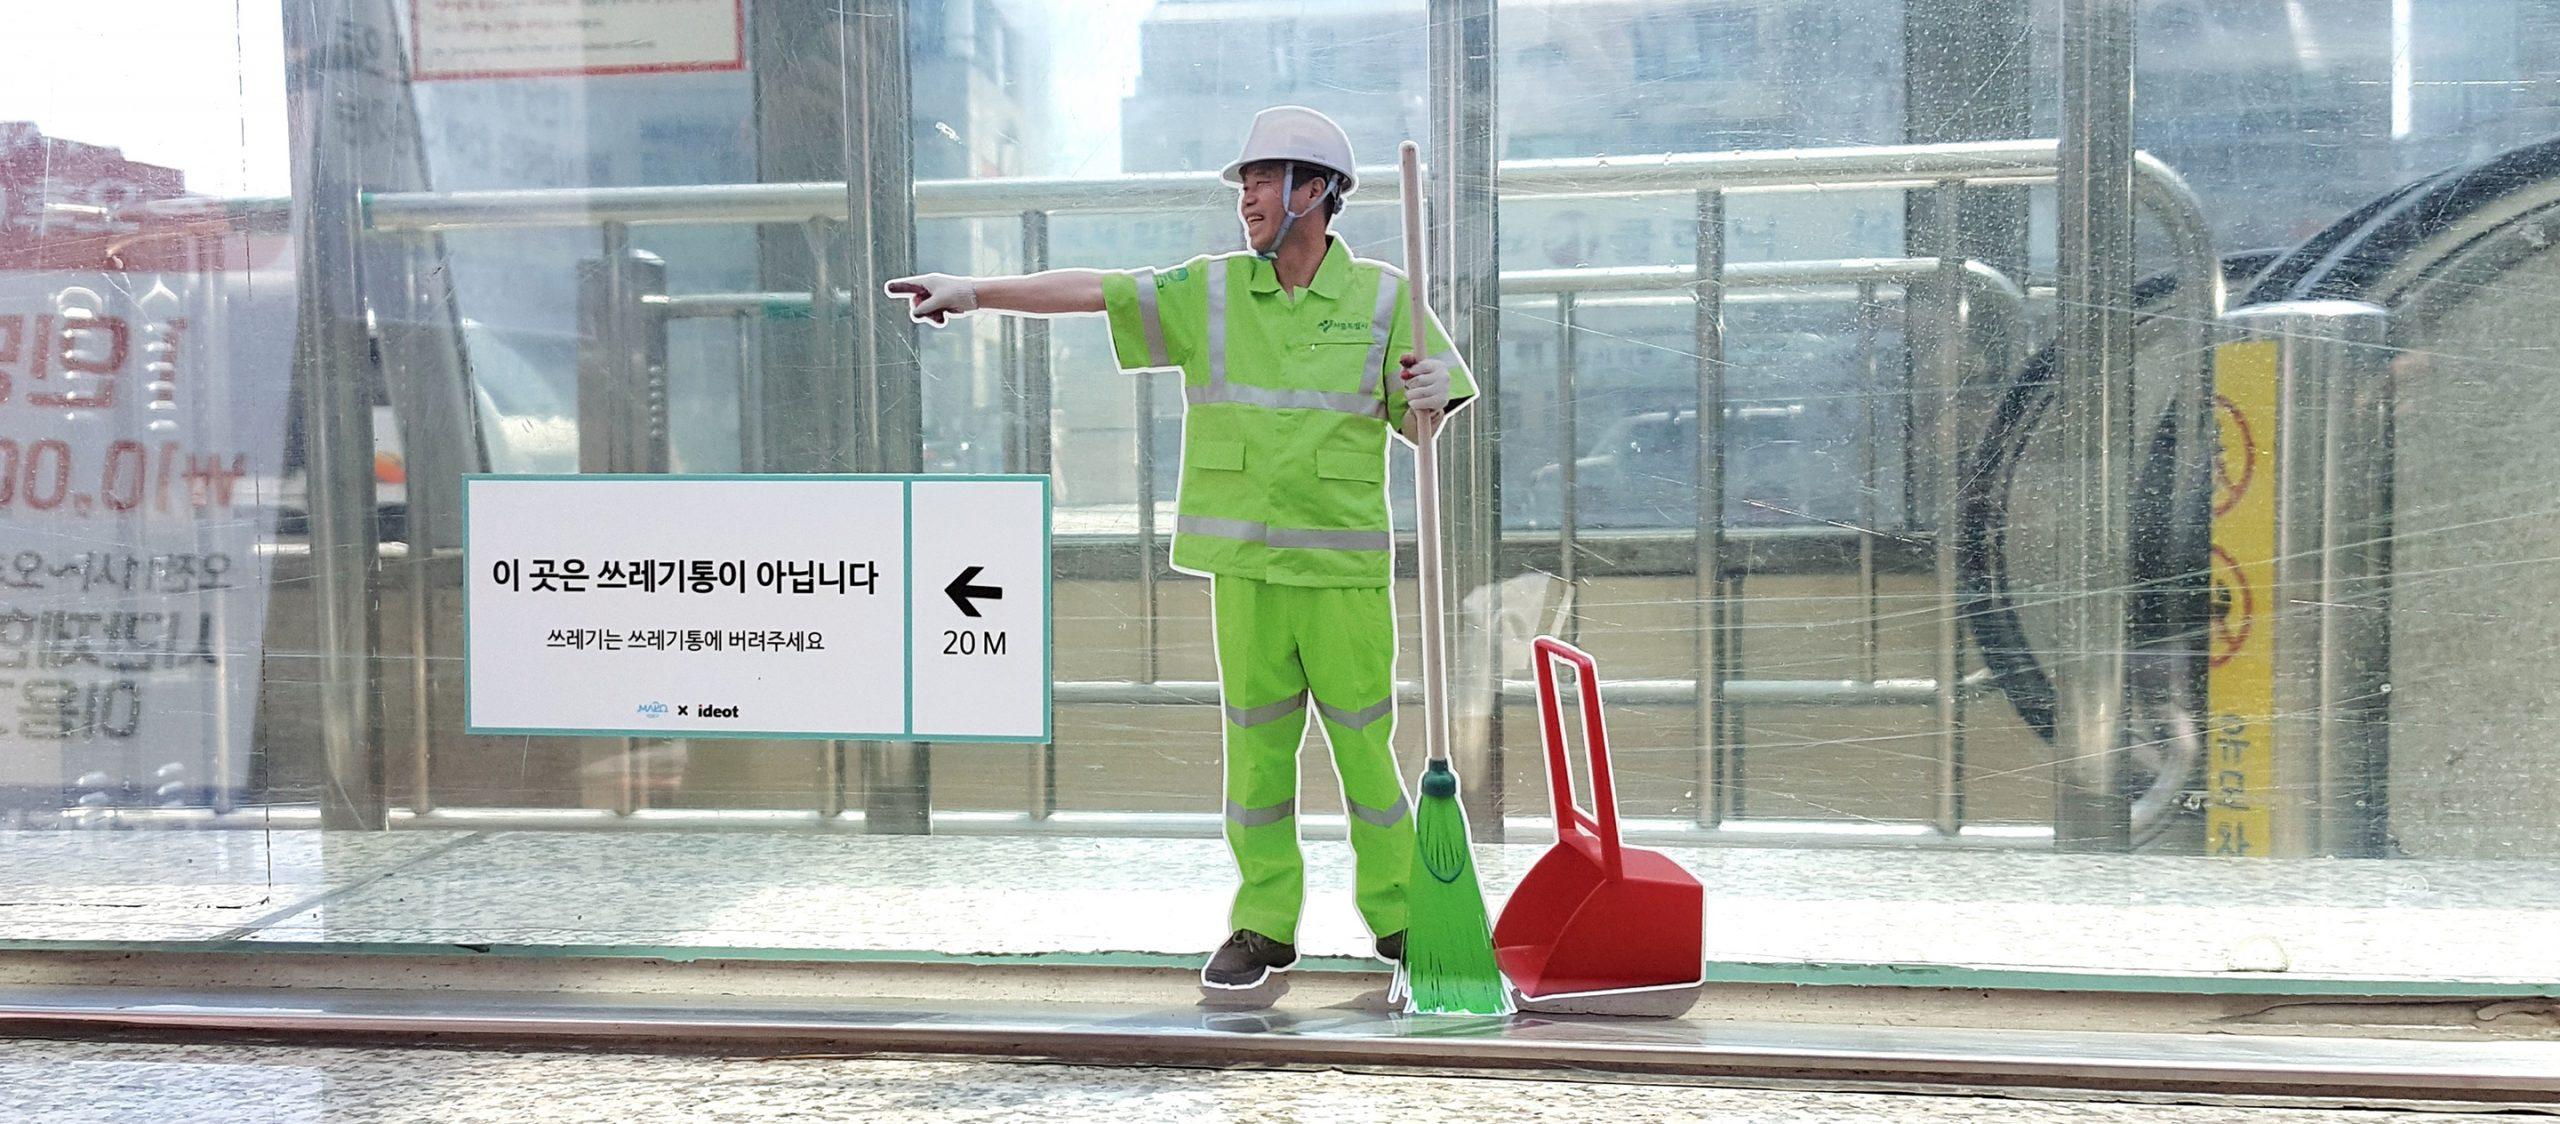 Ideot : เอเจนซีที่เชื่อว่าโฆษณาที่ดีมีพลังเปลี่ยนสังคมเกาหลีให้ดีขึ้นได้